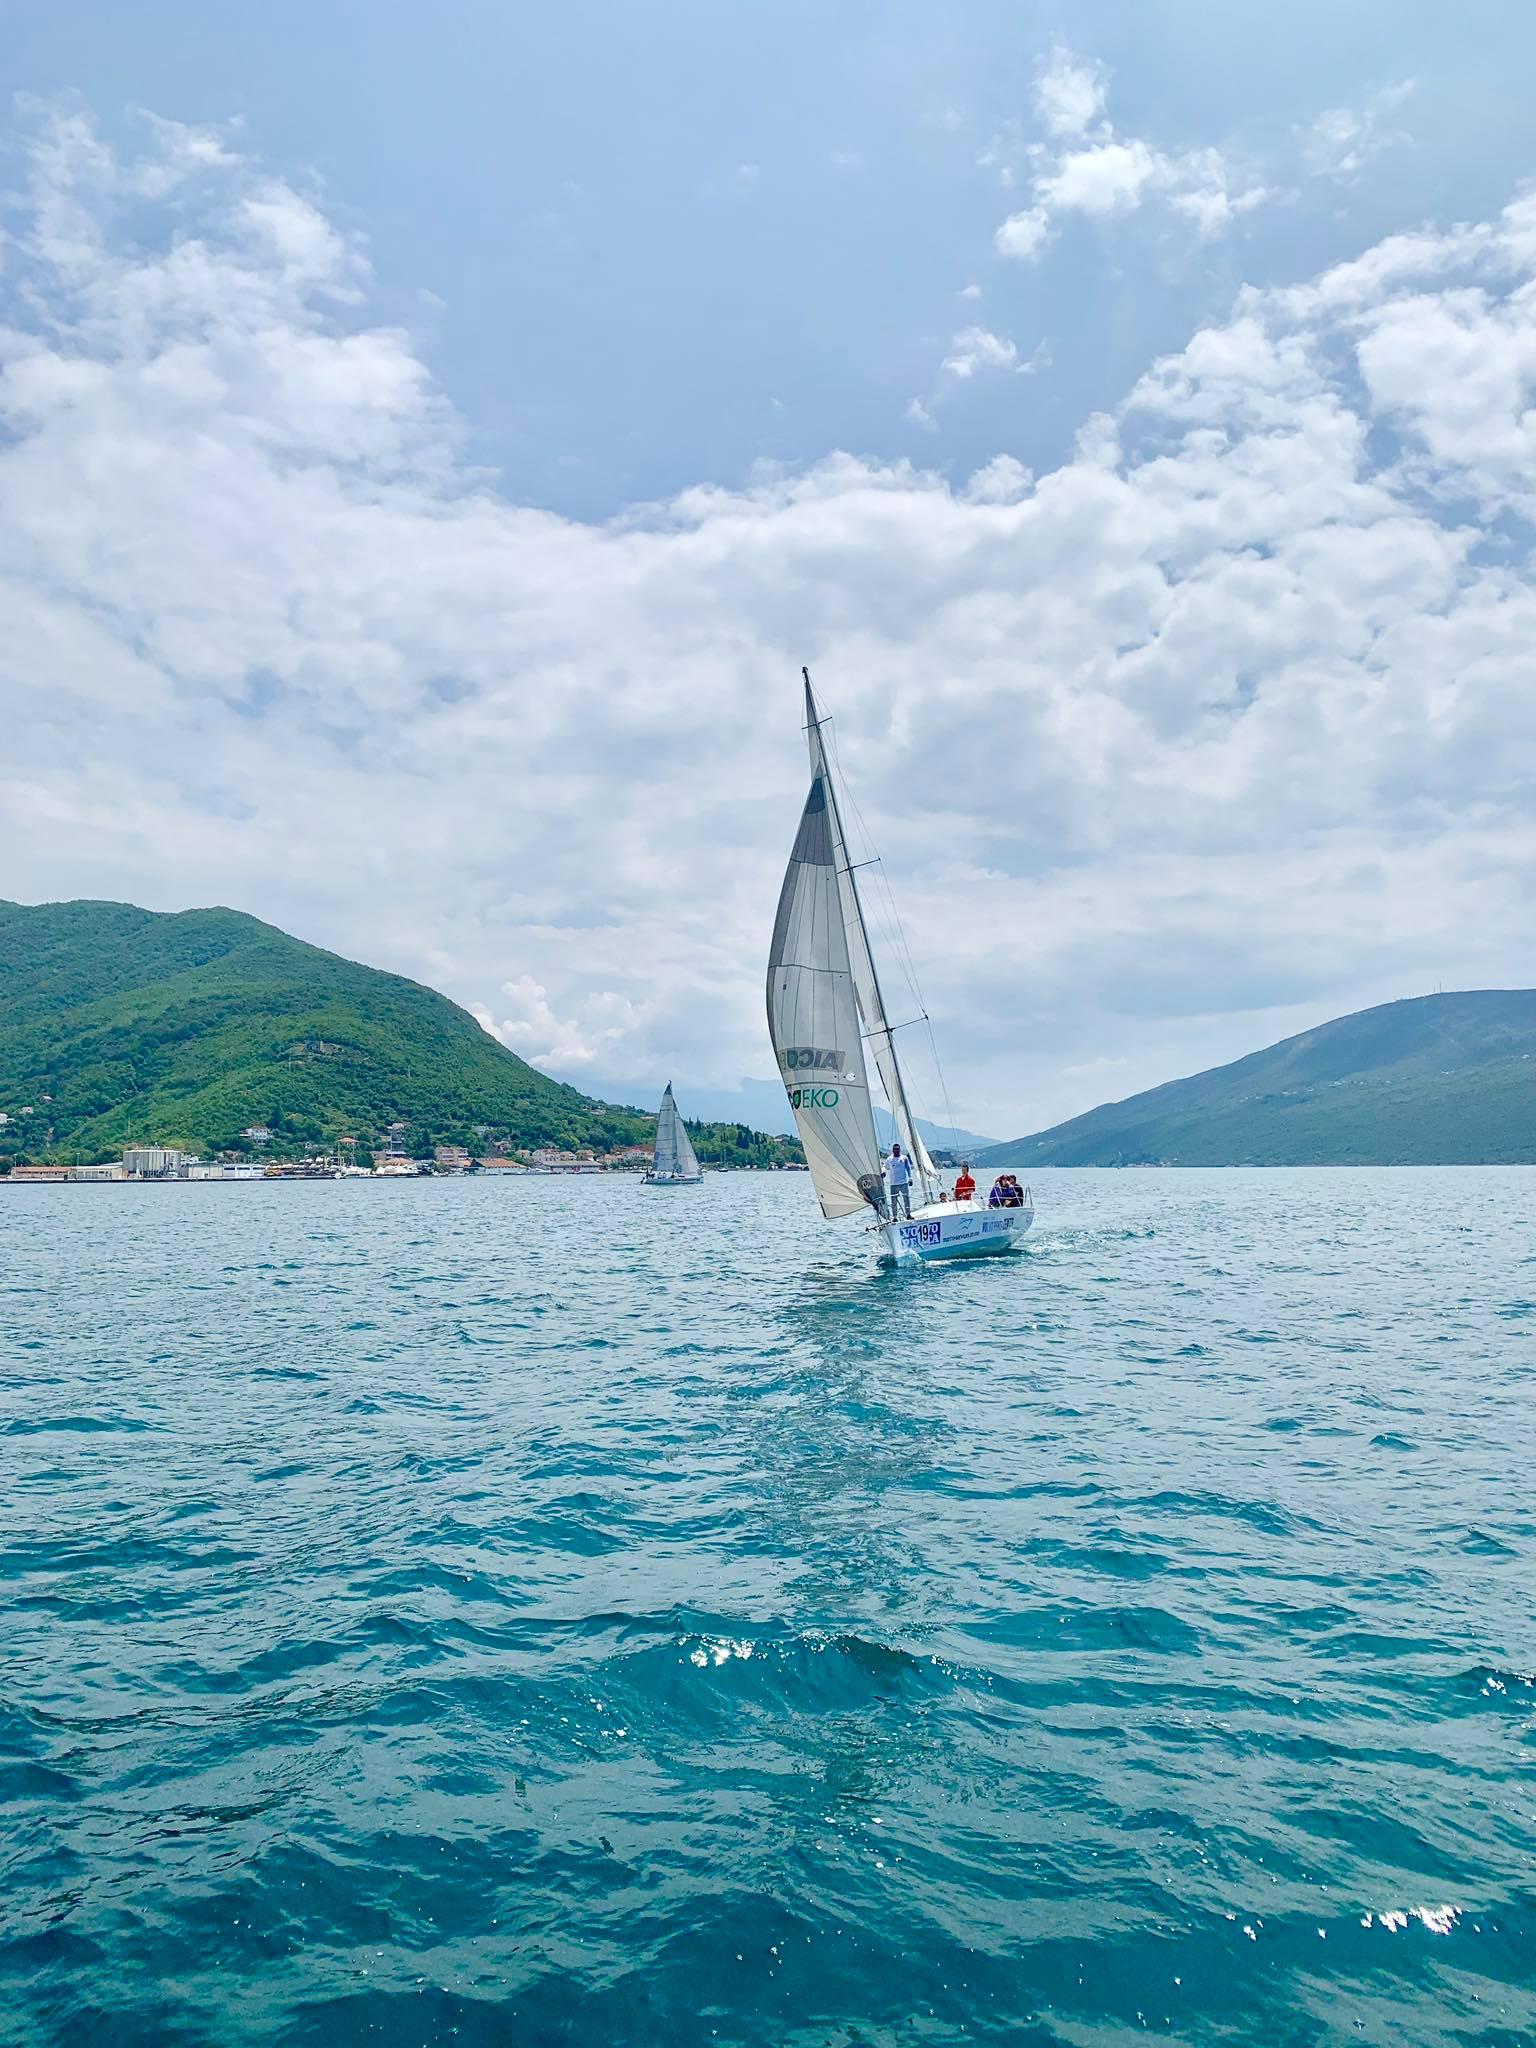 Expat Life in Montenegro Day 2 First full day in Herceg Novi3.jpg